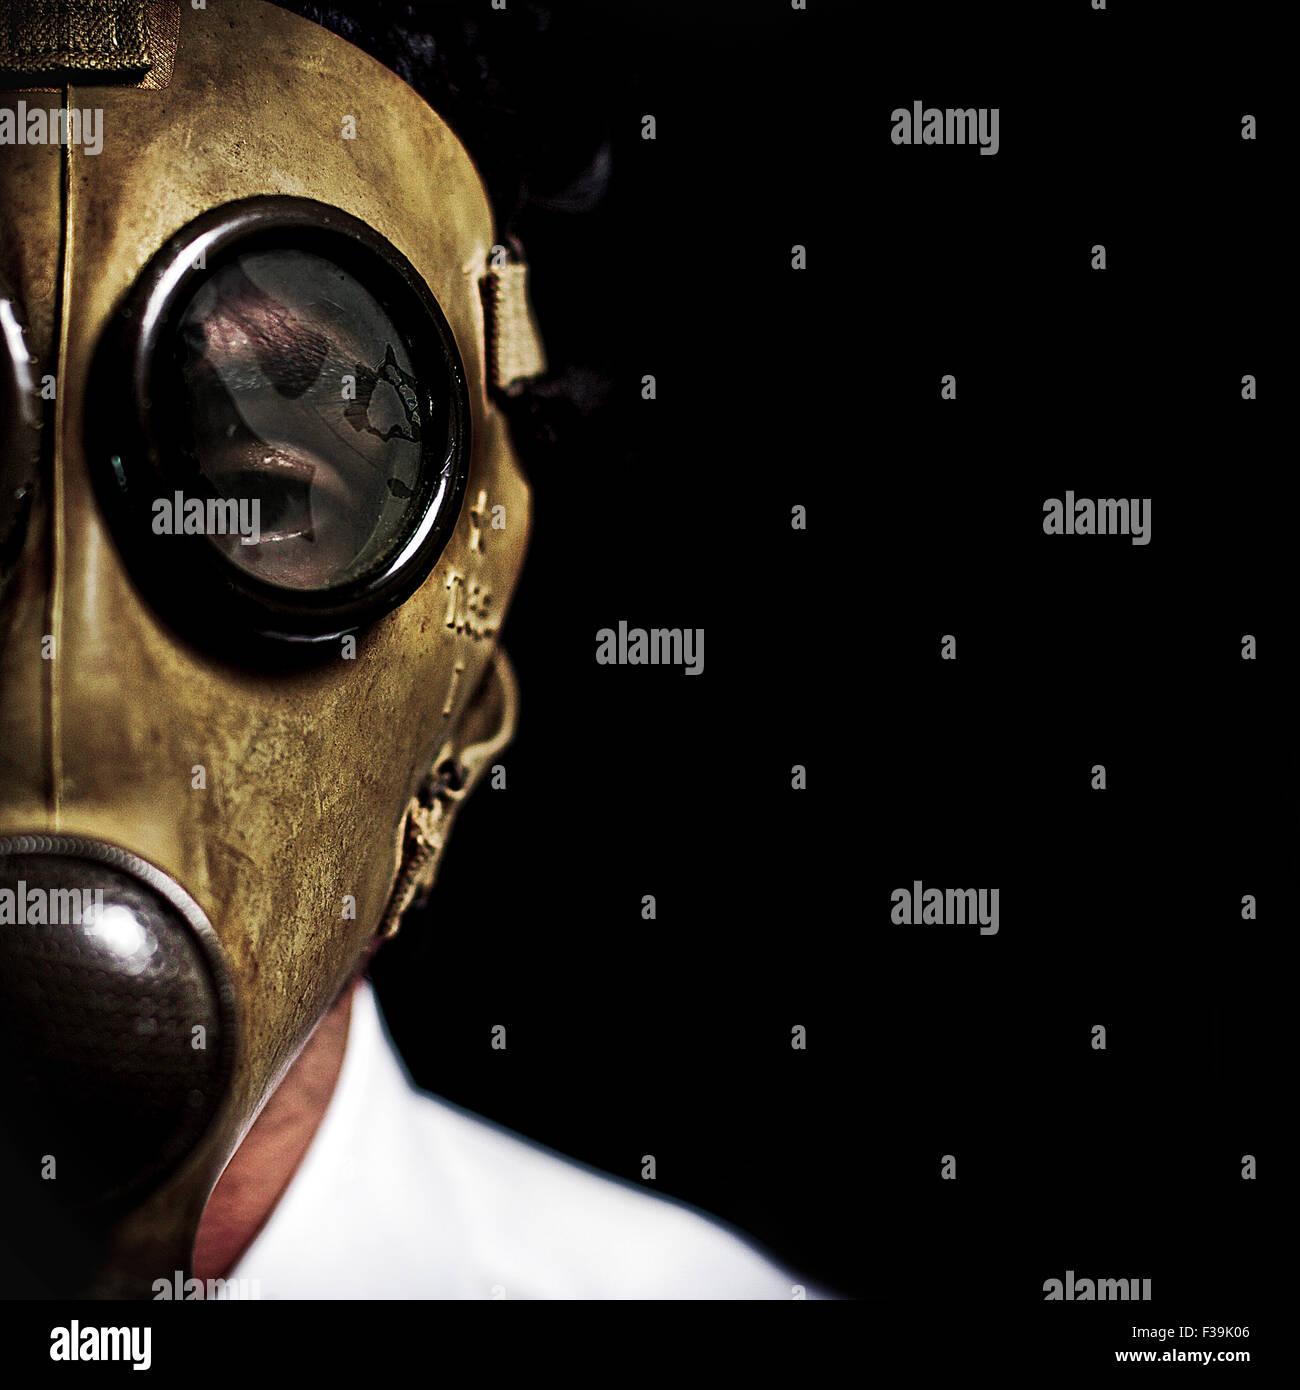 Man wearing a gas mask - Stock Image